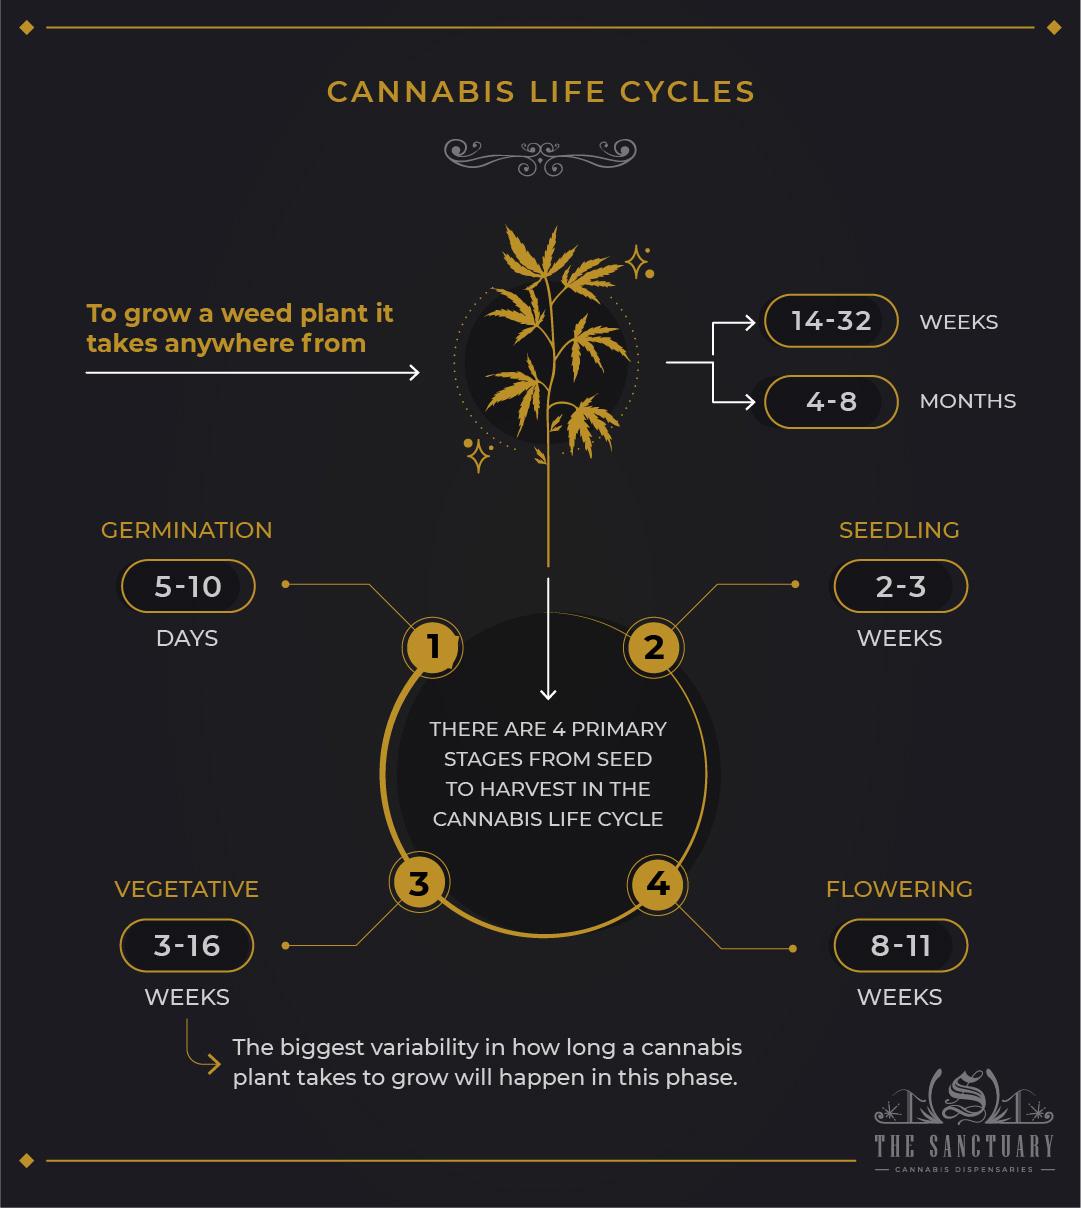 Cannabis life cycles